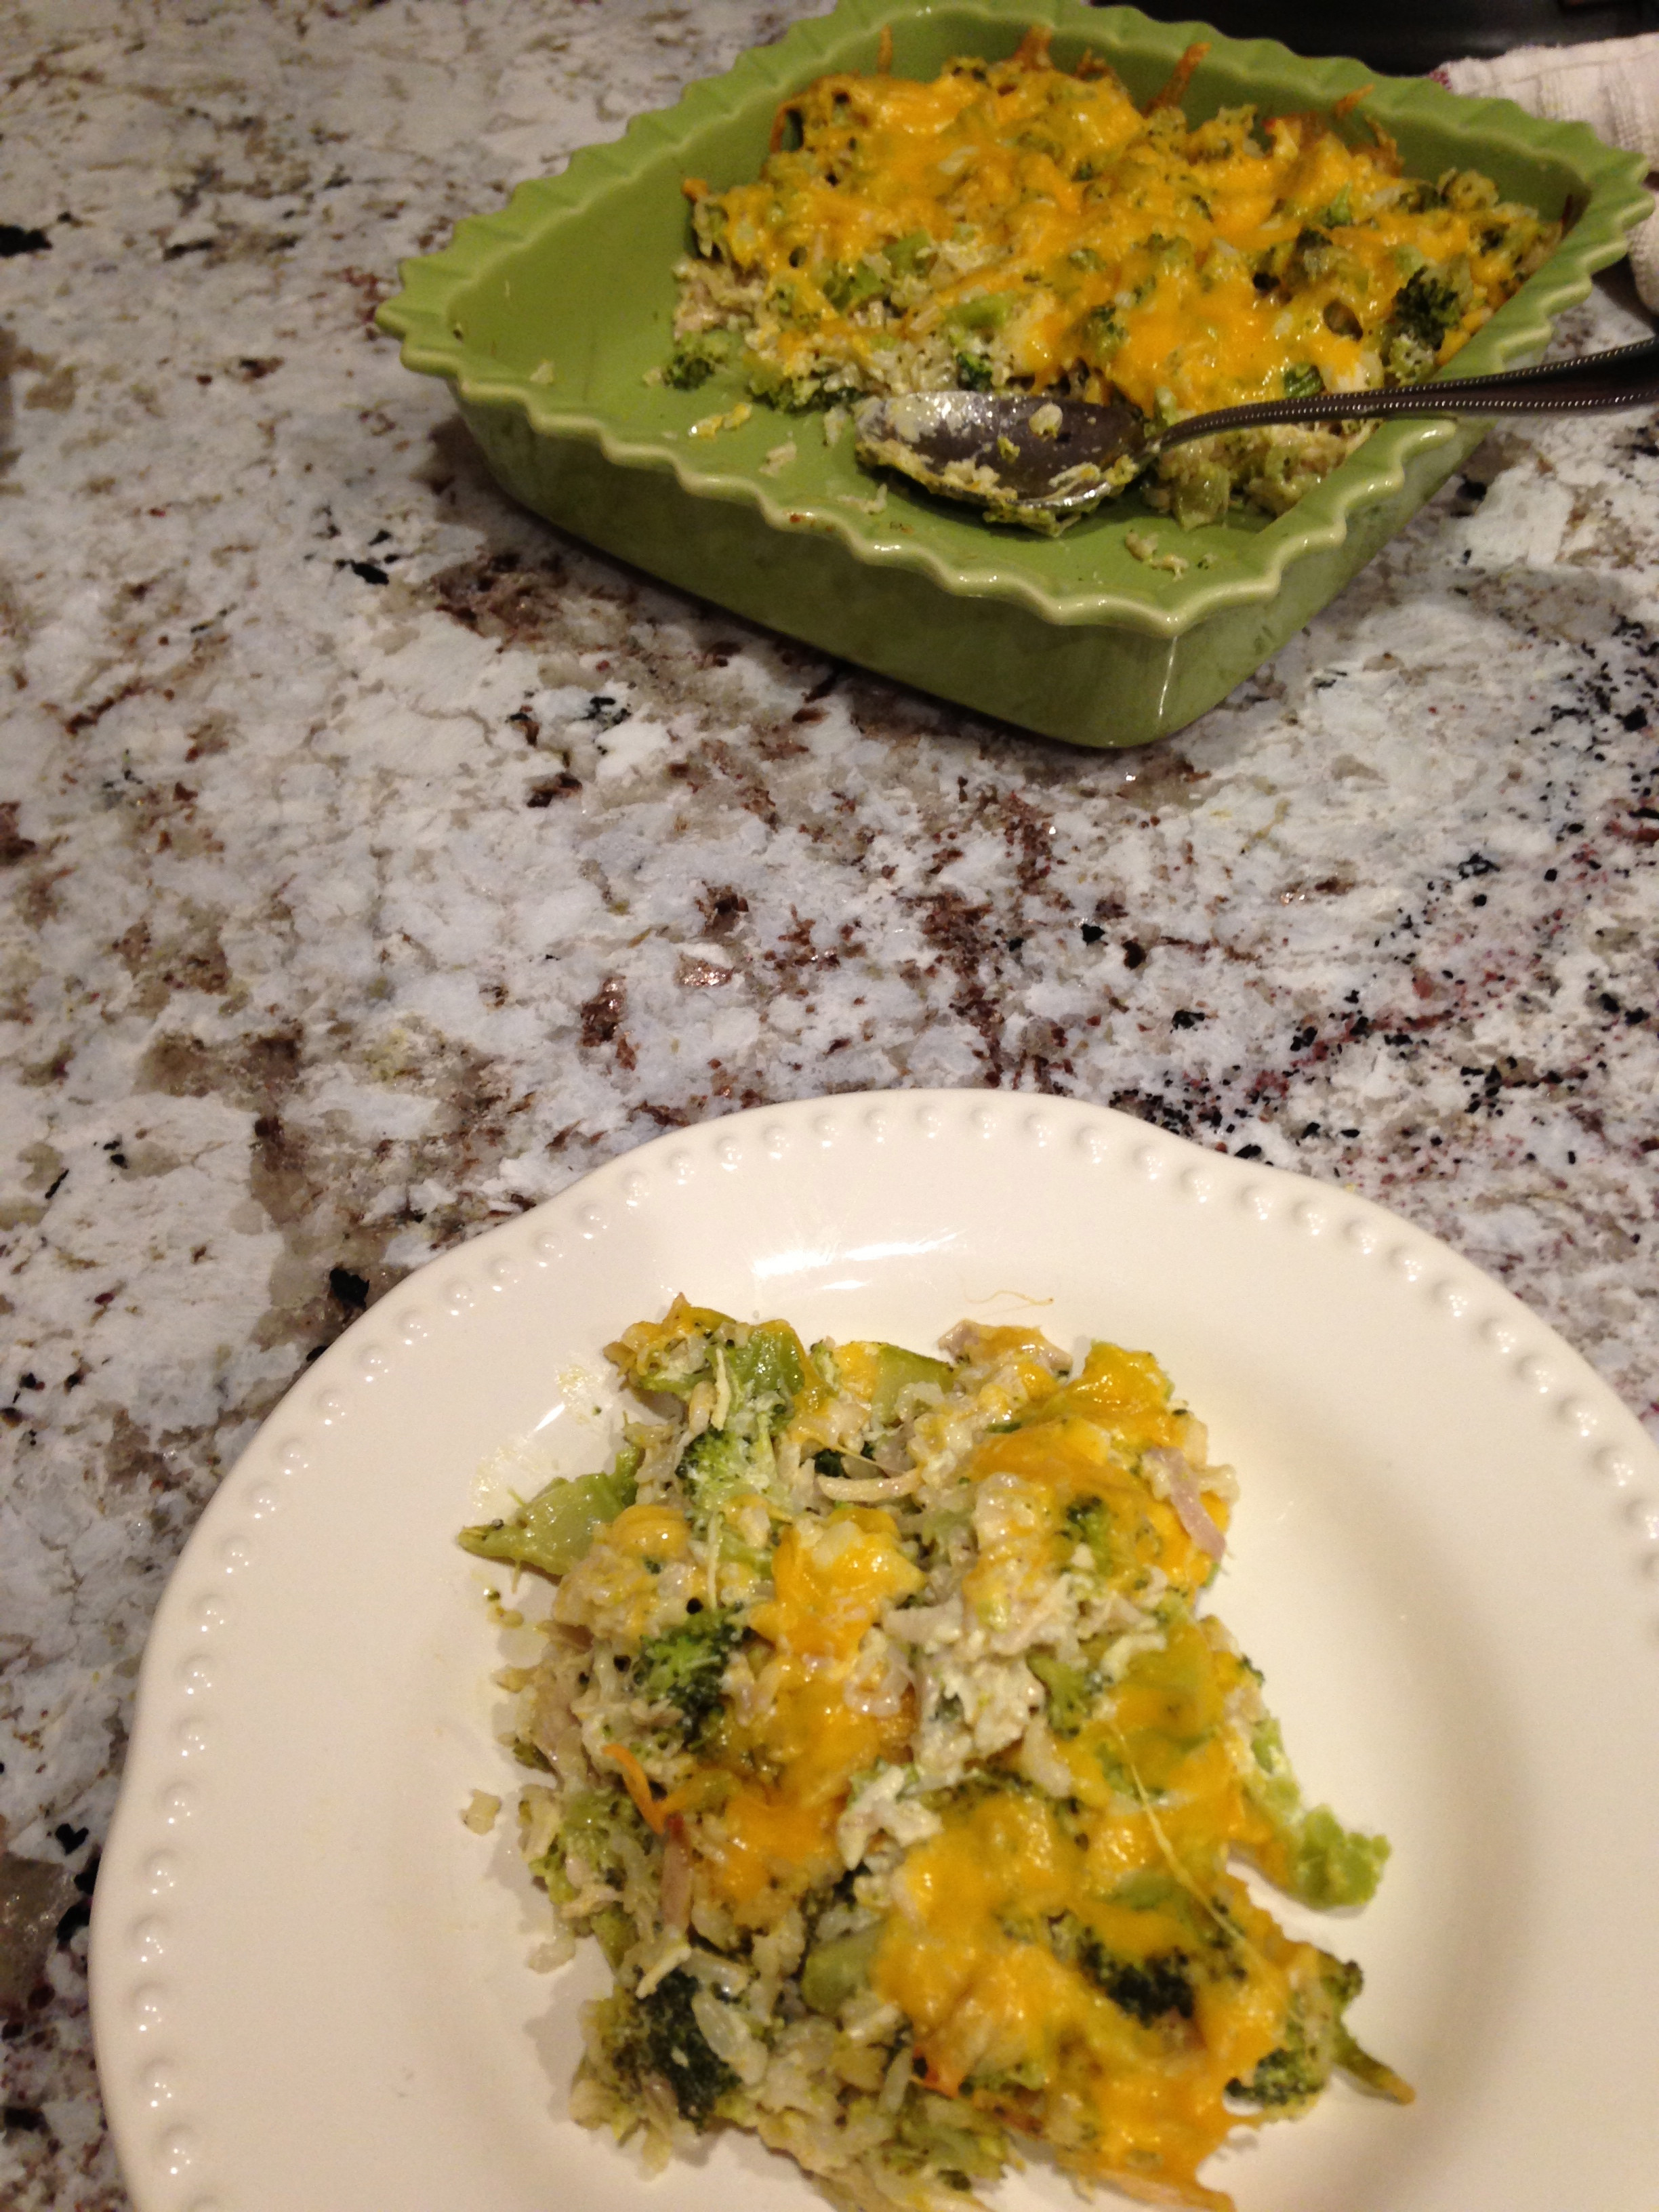 Healthy Chicken Broccoli Rice Casserole No Canned Soup  No Canned Soup Broccoli Chicken Rice Cheddar Casserole